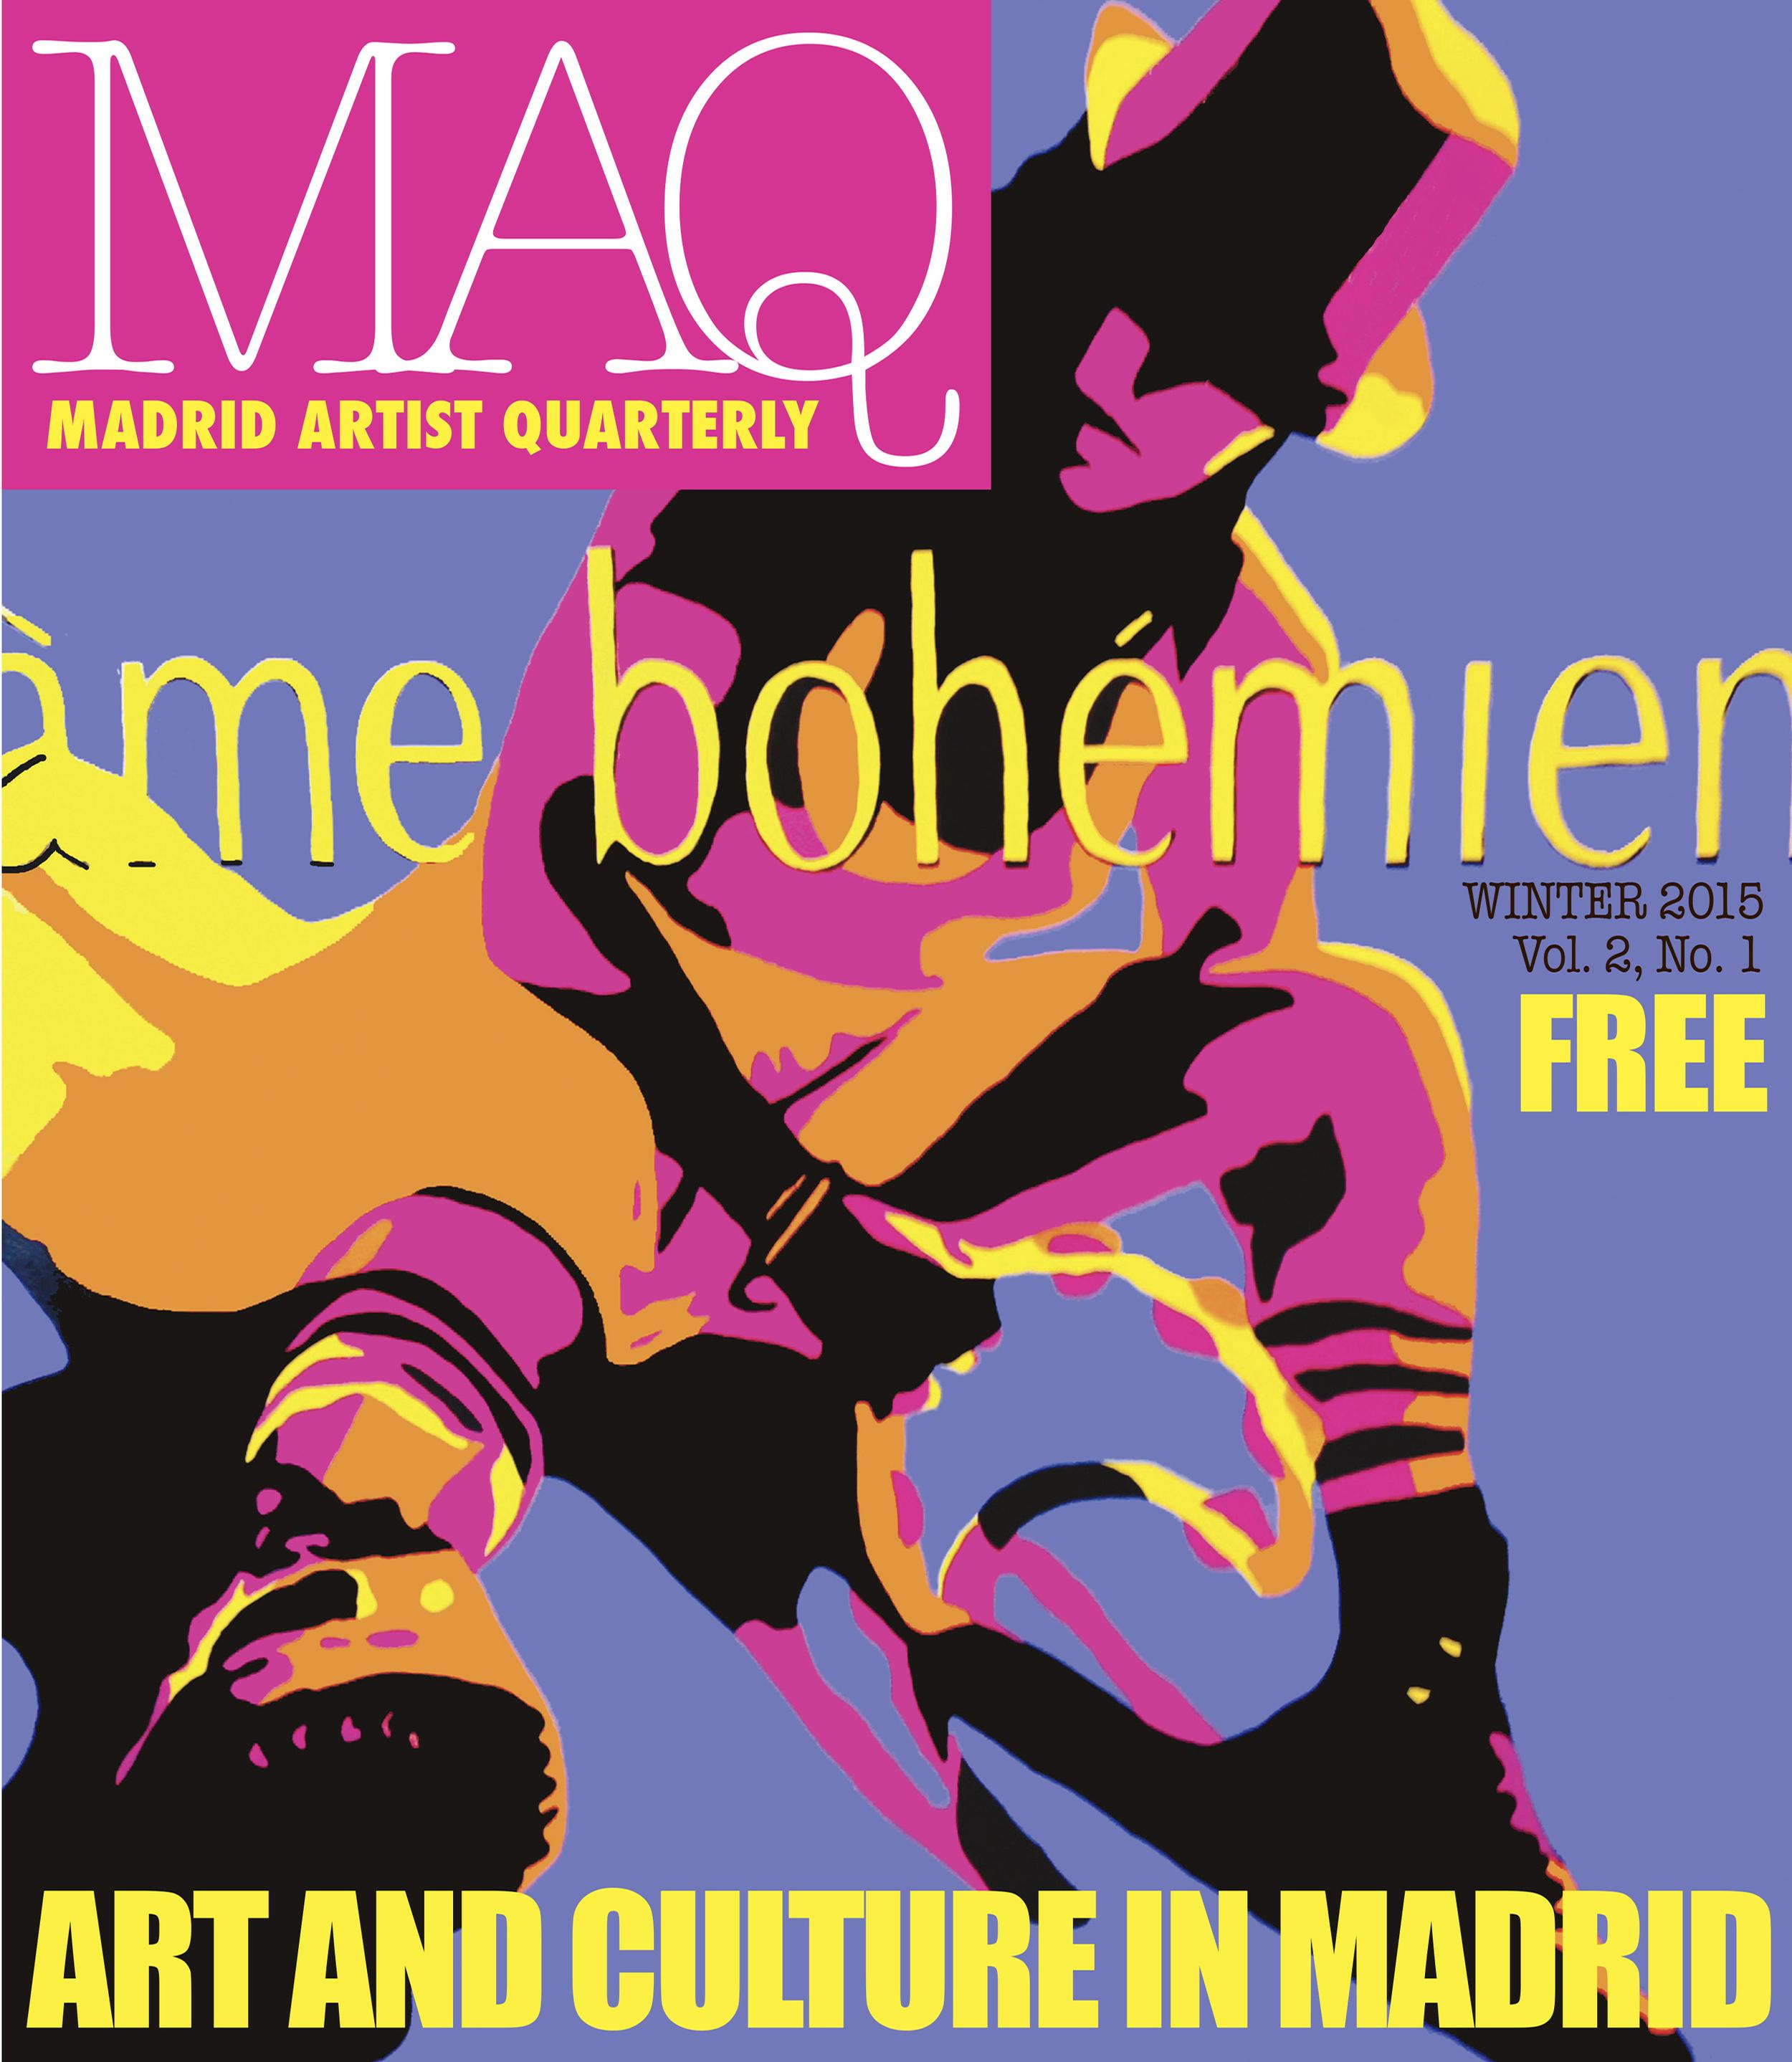 on the cover of the MadridArtistQuarterly.com